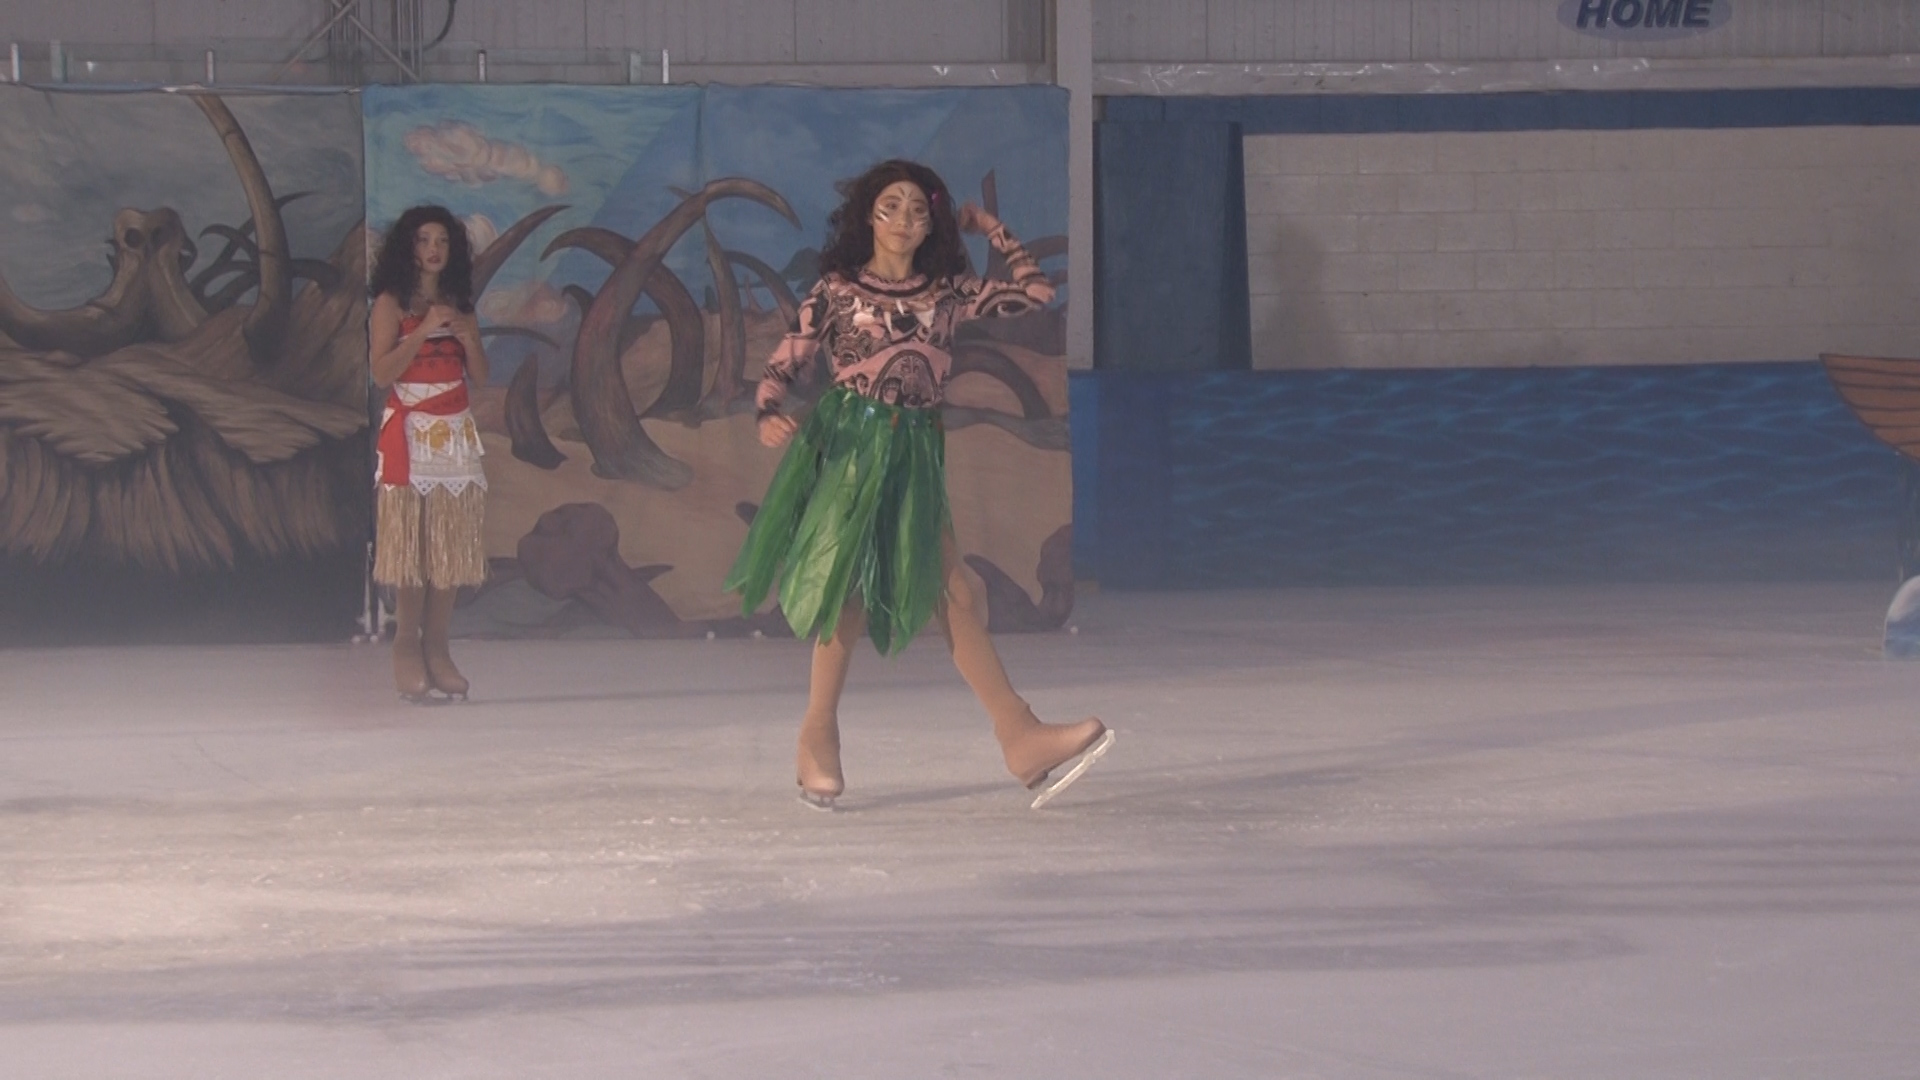 Power Play Maui Skate on Ice 071417.00_32_22_07.Still050.jpg